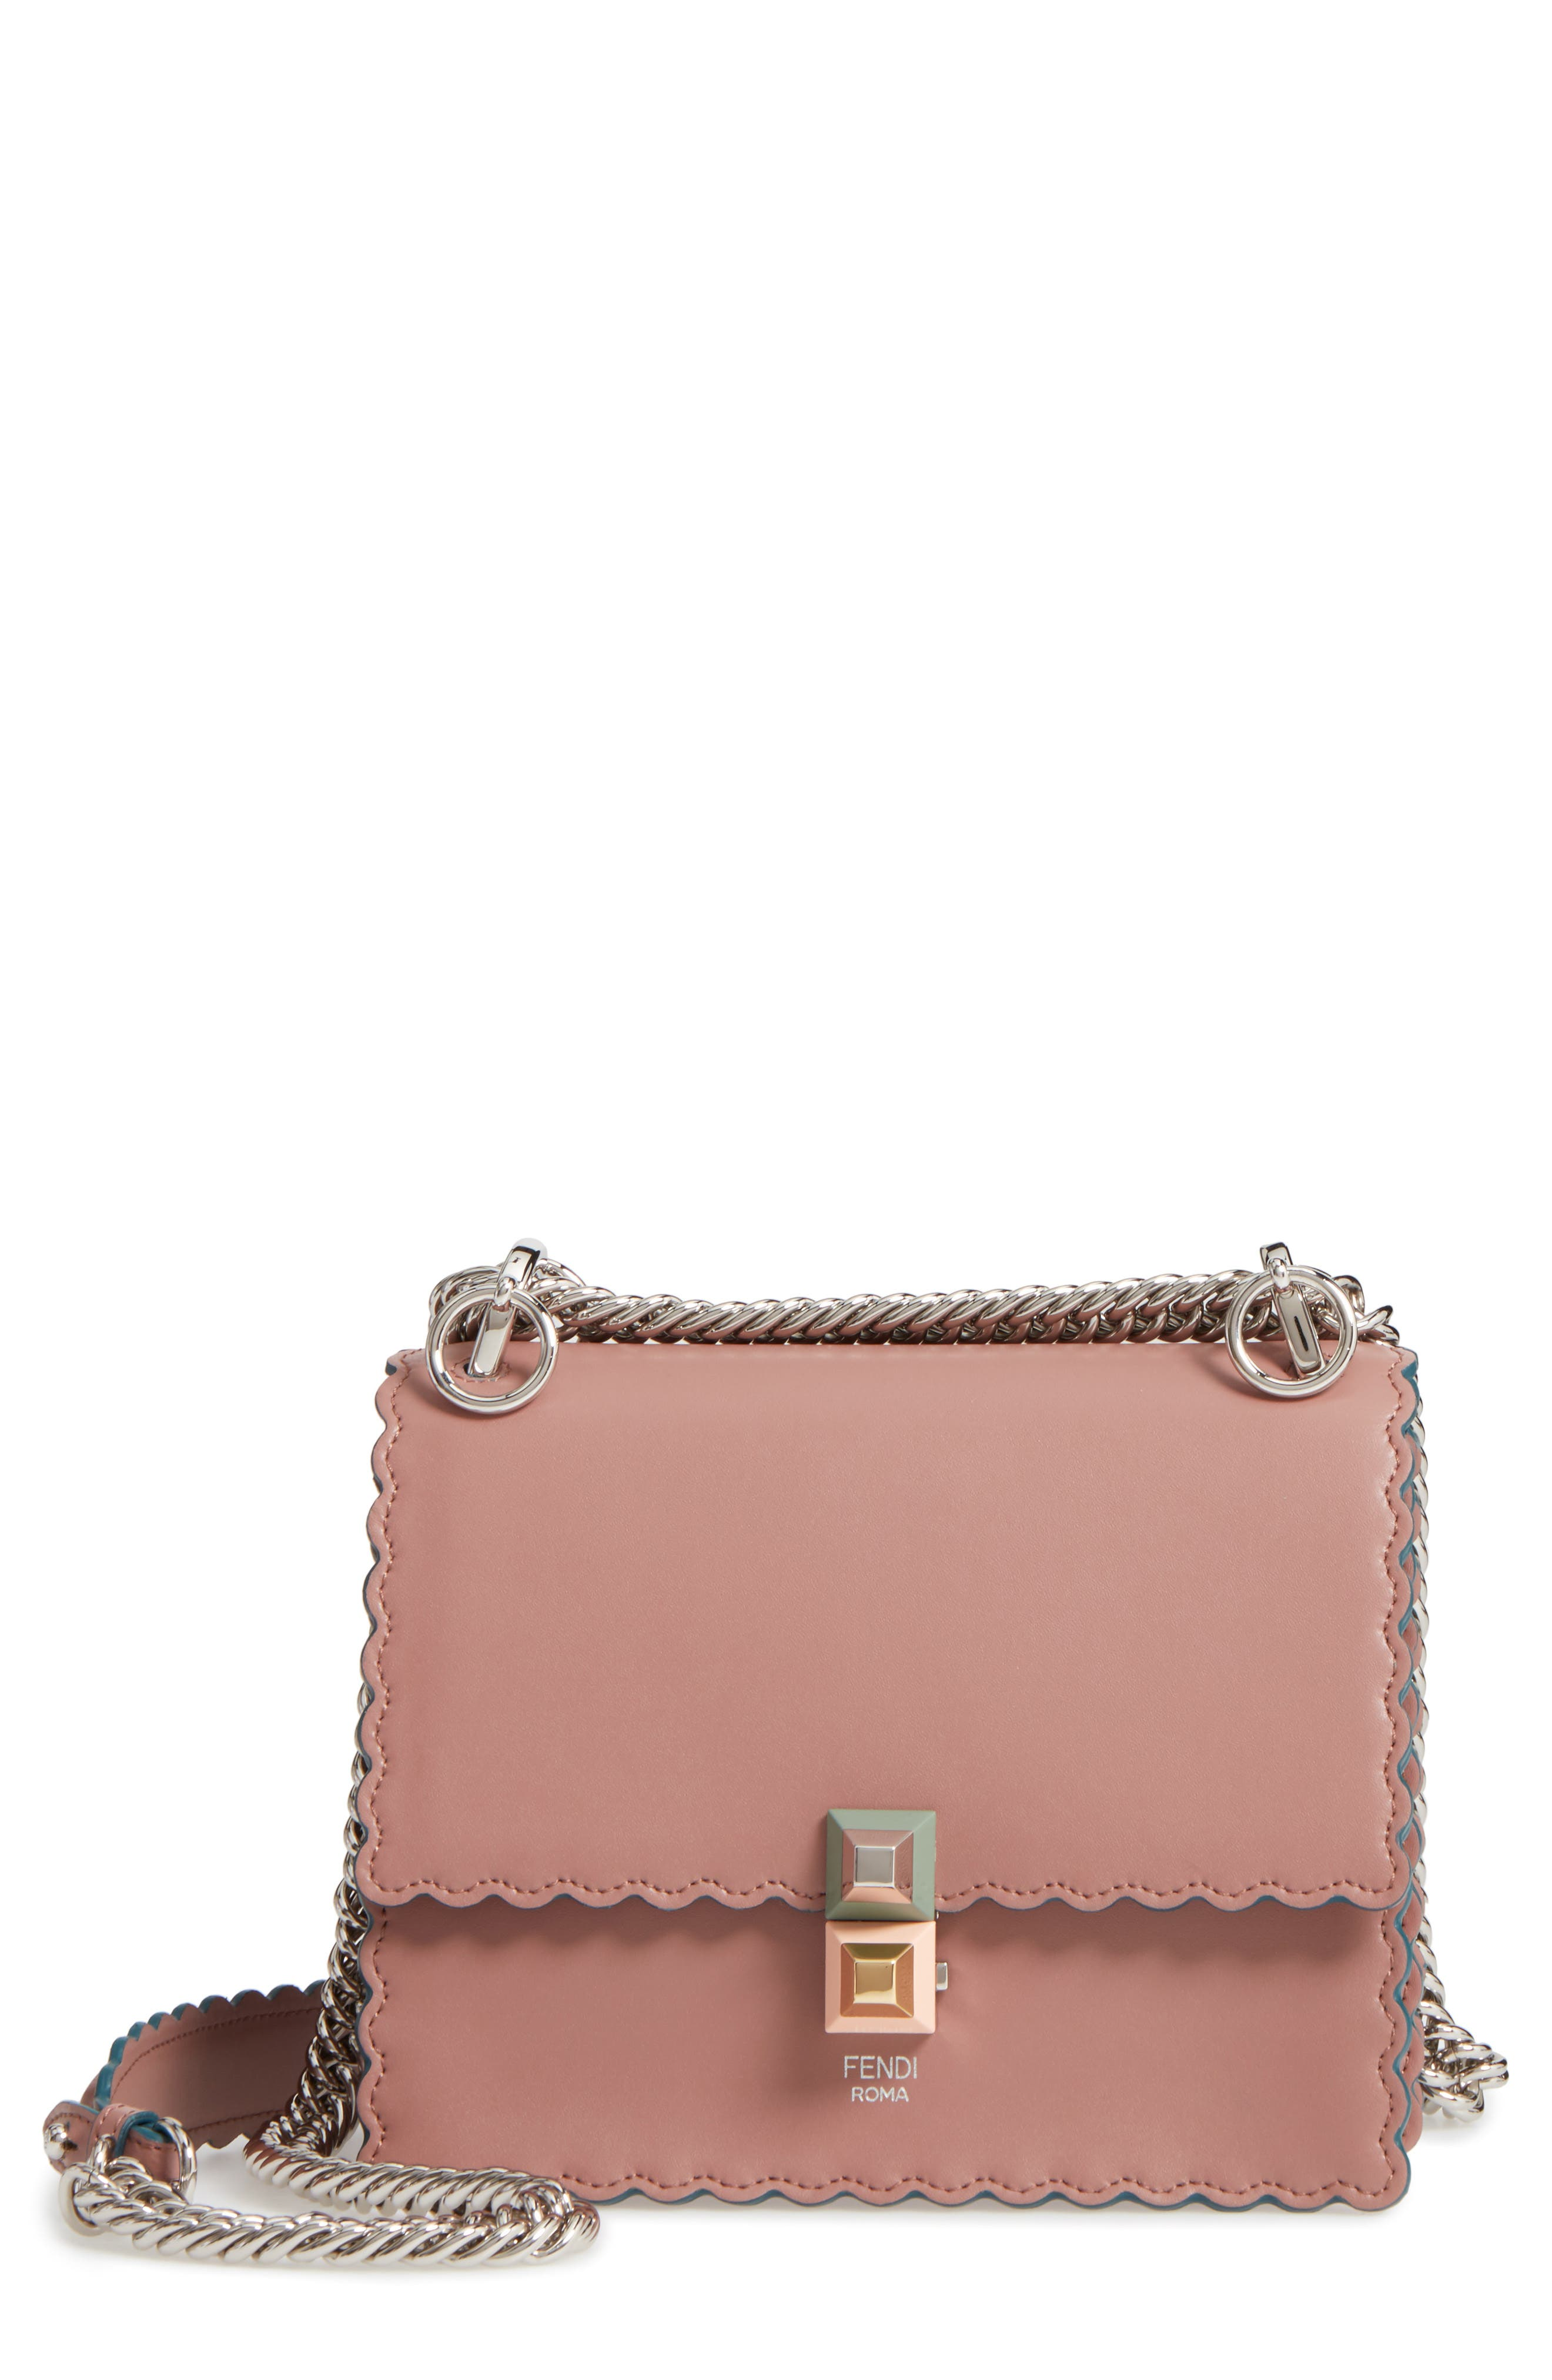 Small Kan I Scallop Leather Shoulder Bag,                             Main thumbnail 1, color,